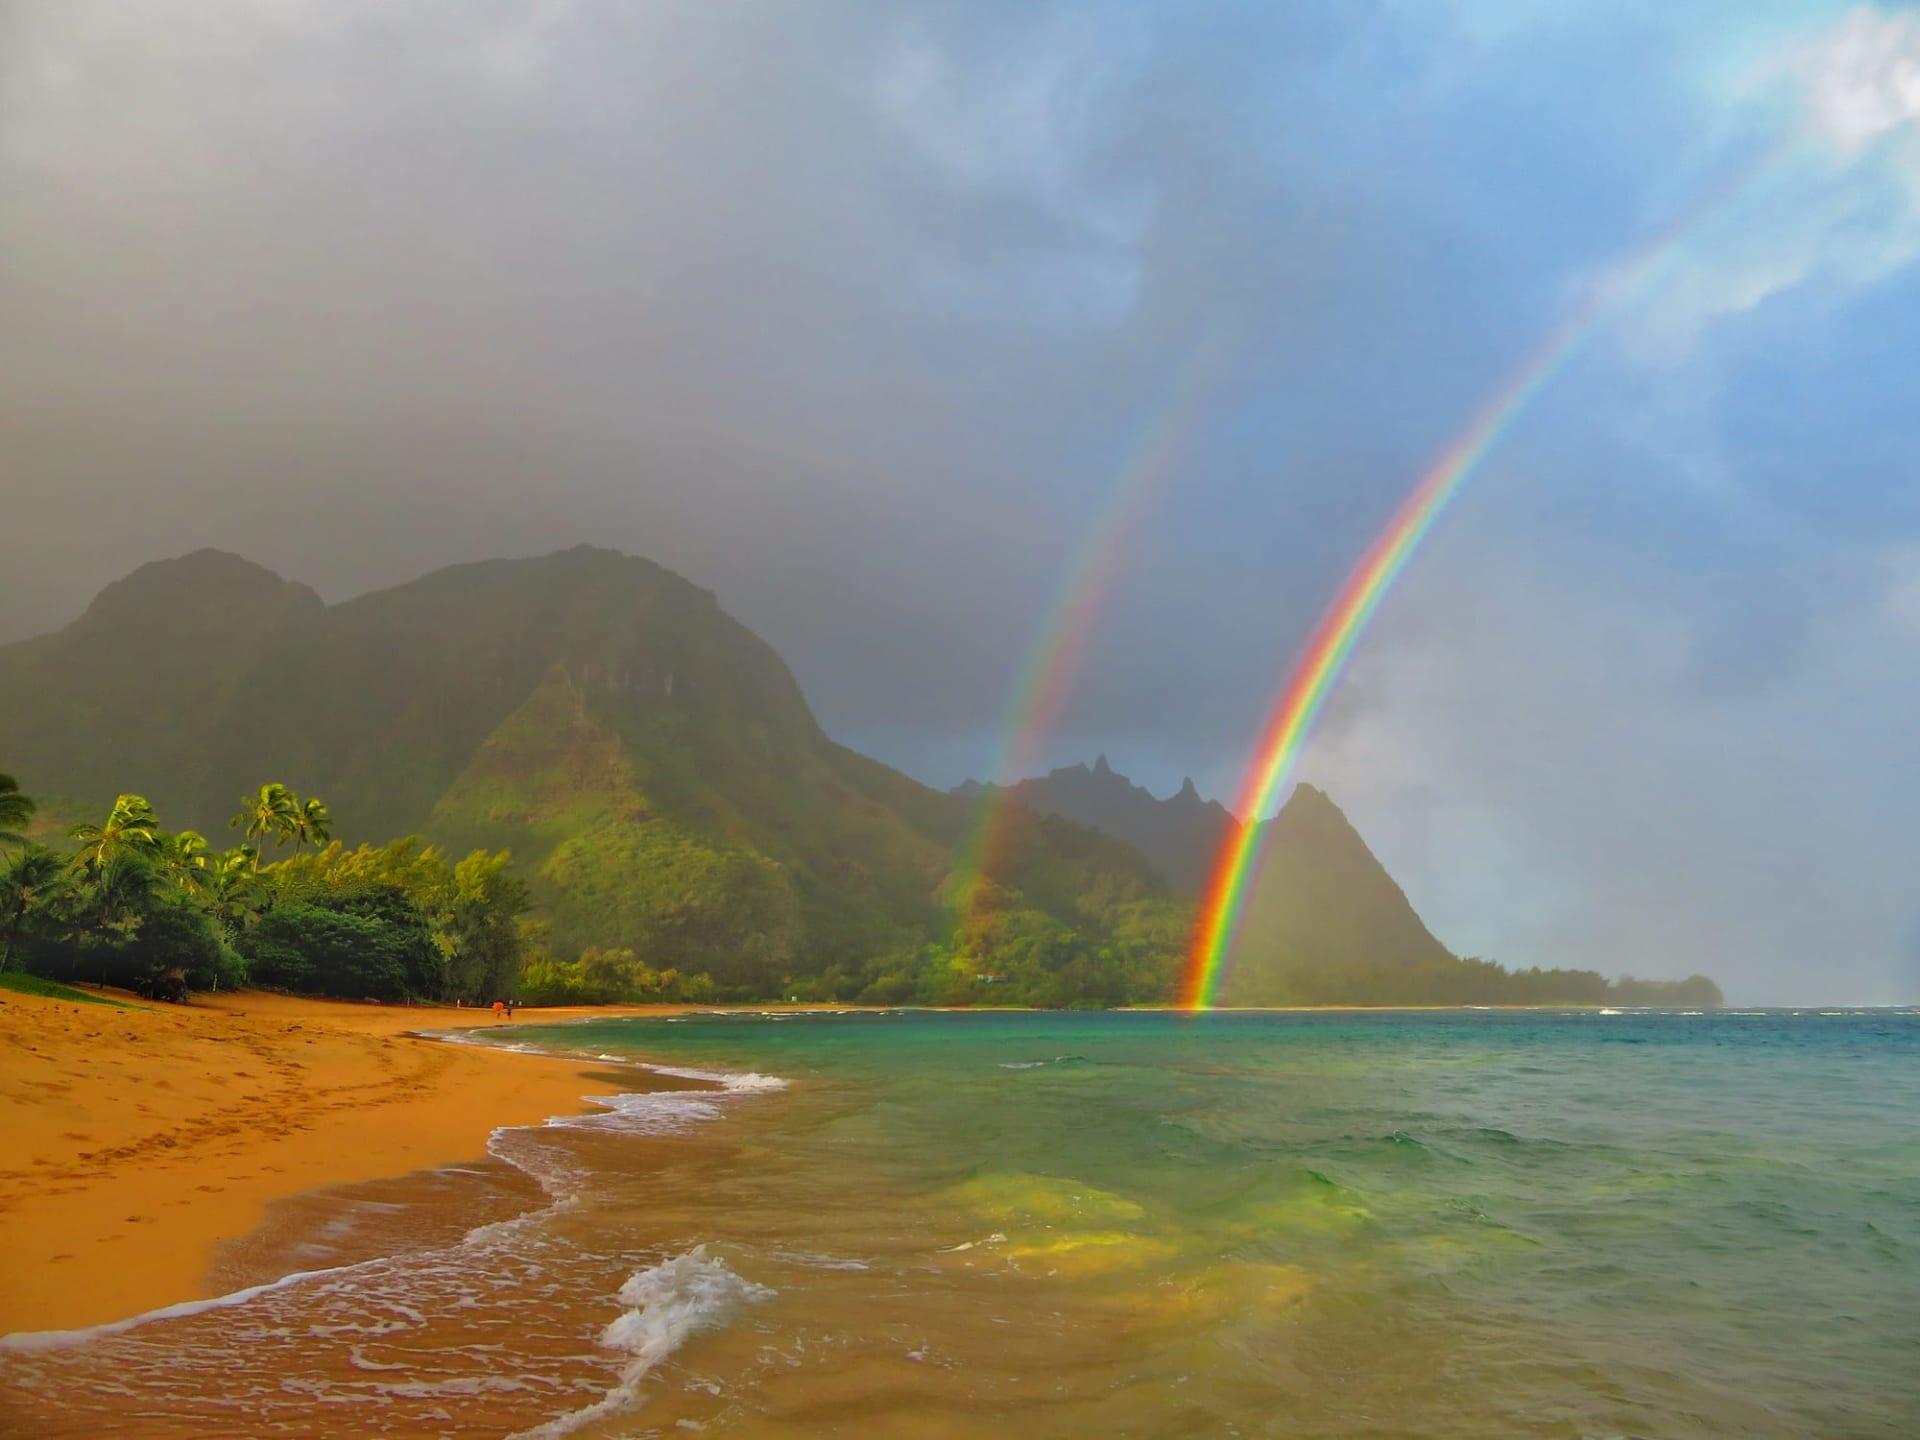 Hawaii predicted to have an average 2021 hurricane season